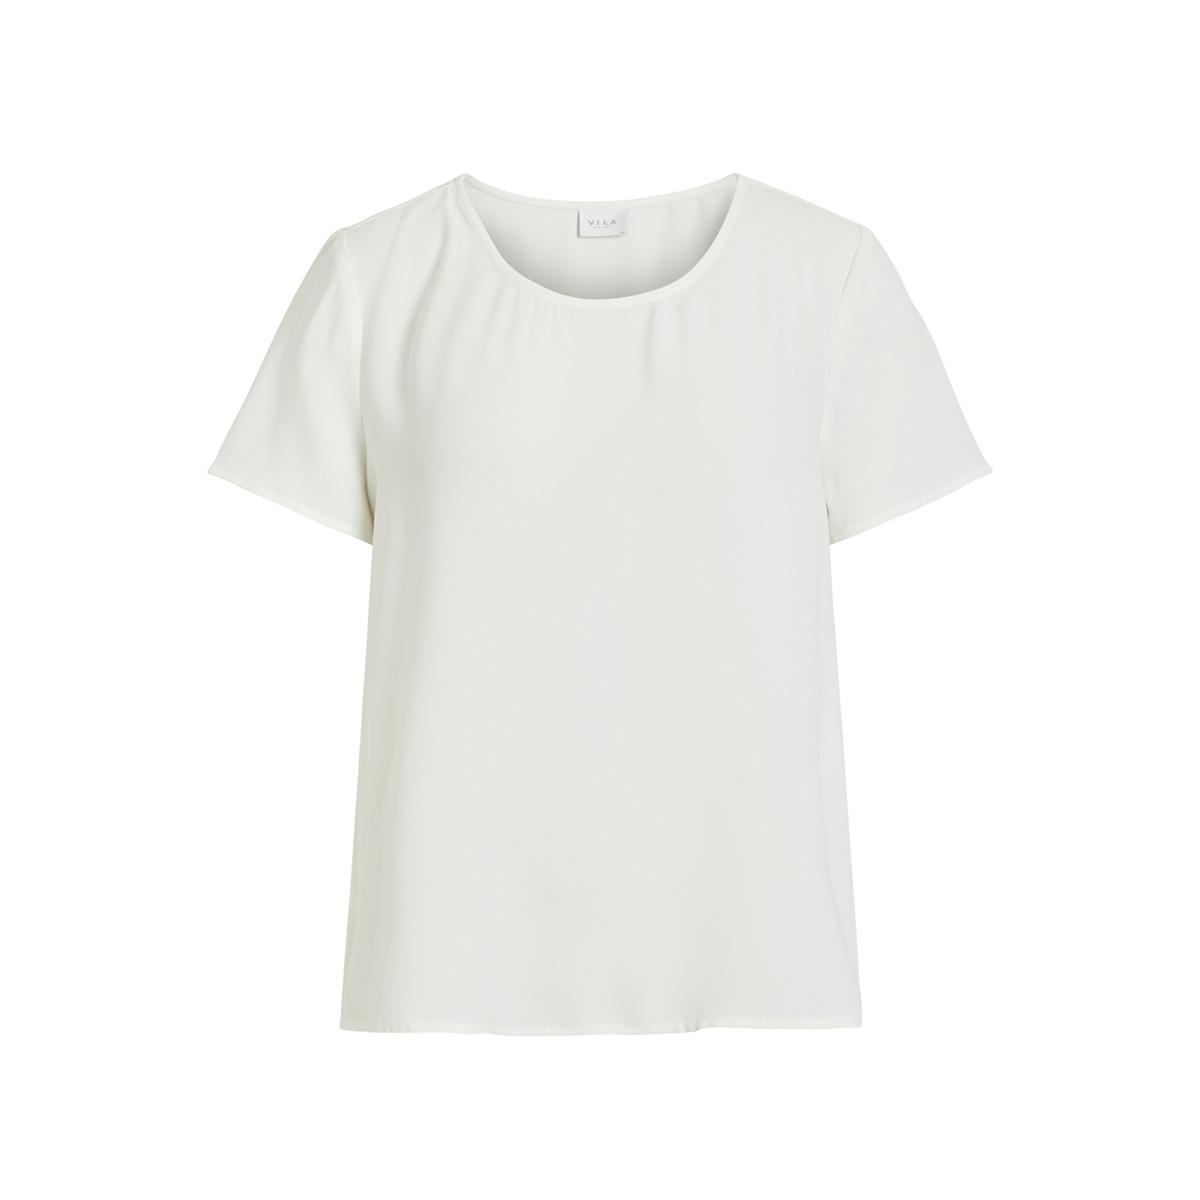 vilaia s/s top - noos 14049862 vila t-shirt cloud dancer